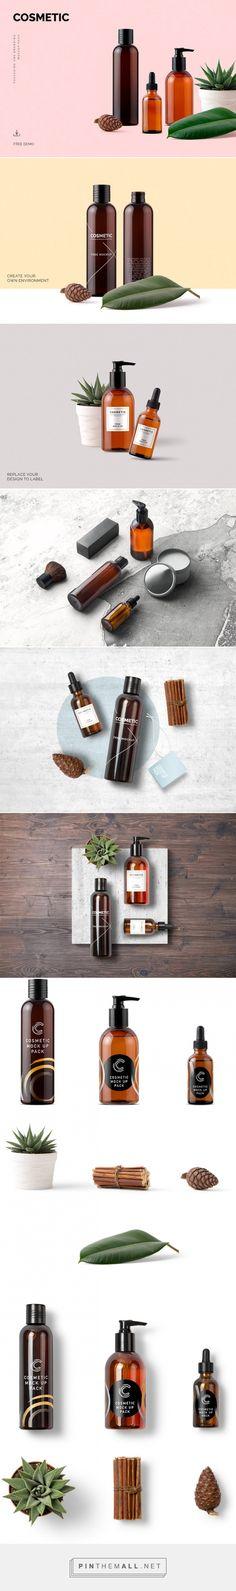 Free Mockup: Cosmetic Mockup Pack   #mockup #beauty #cosmetic - created via https://pinthemall.net